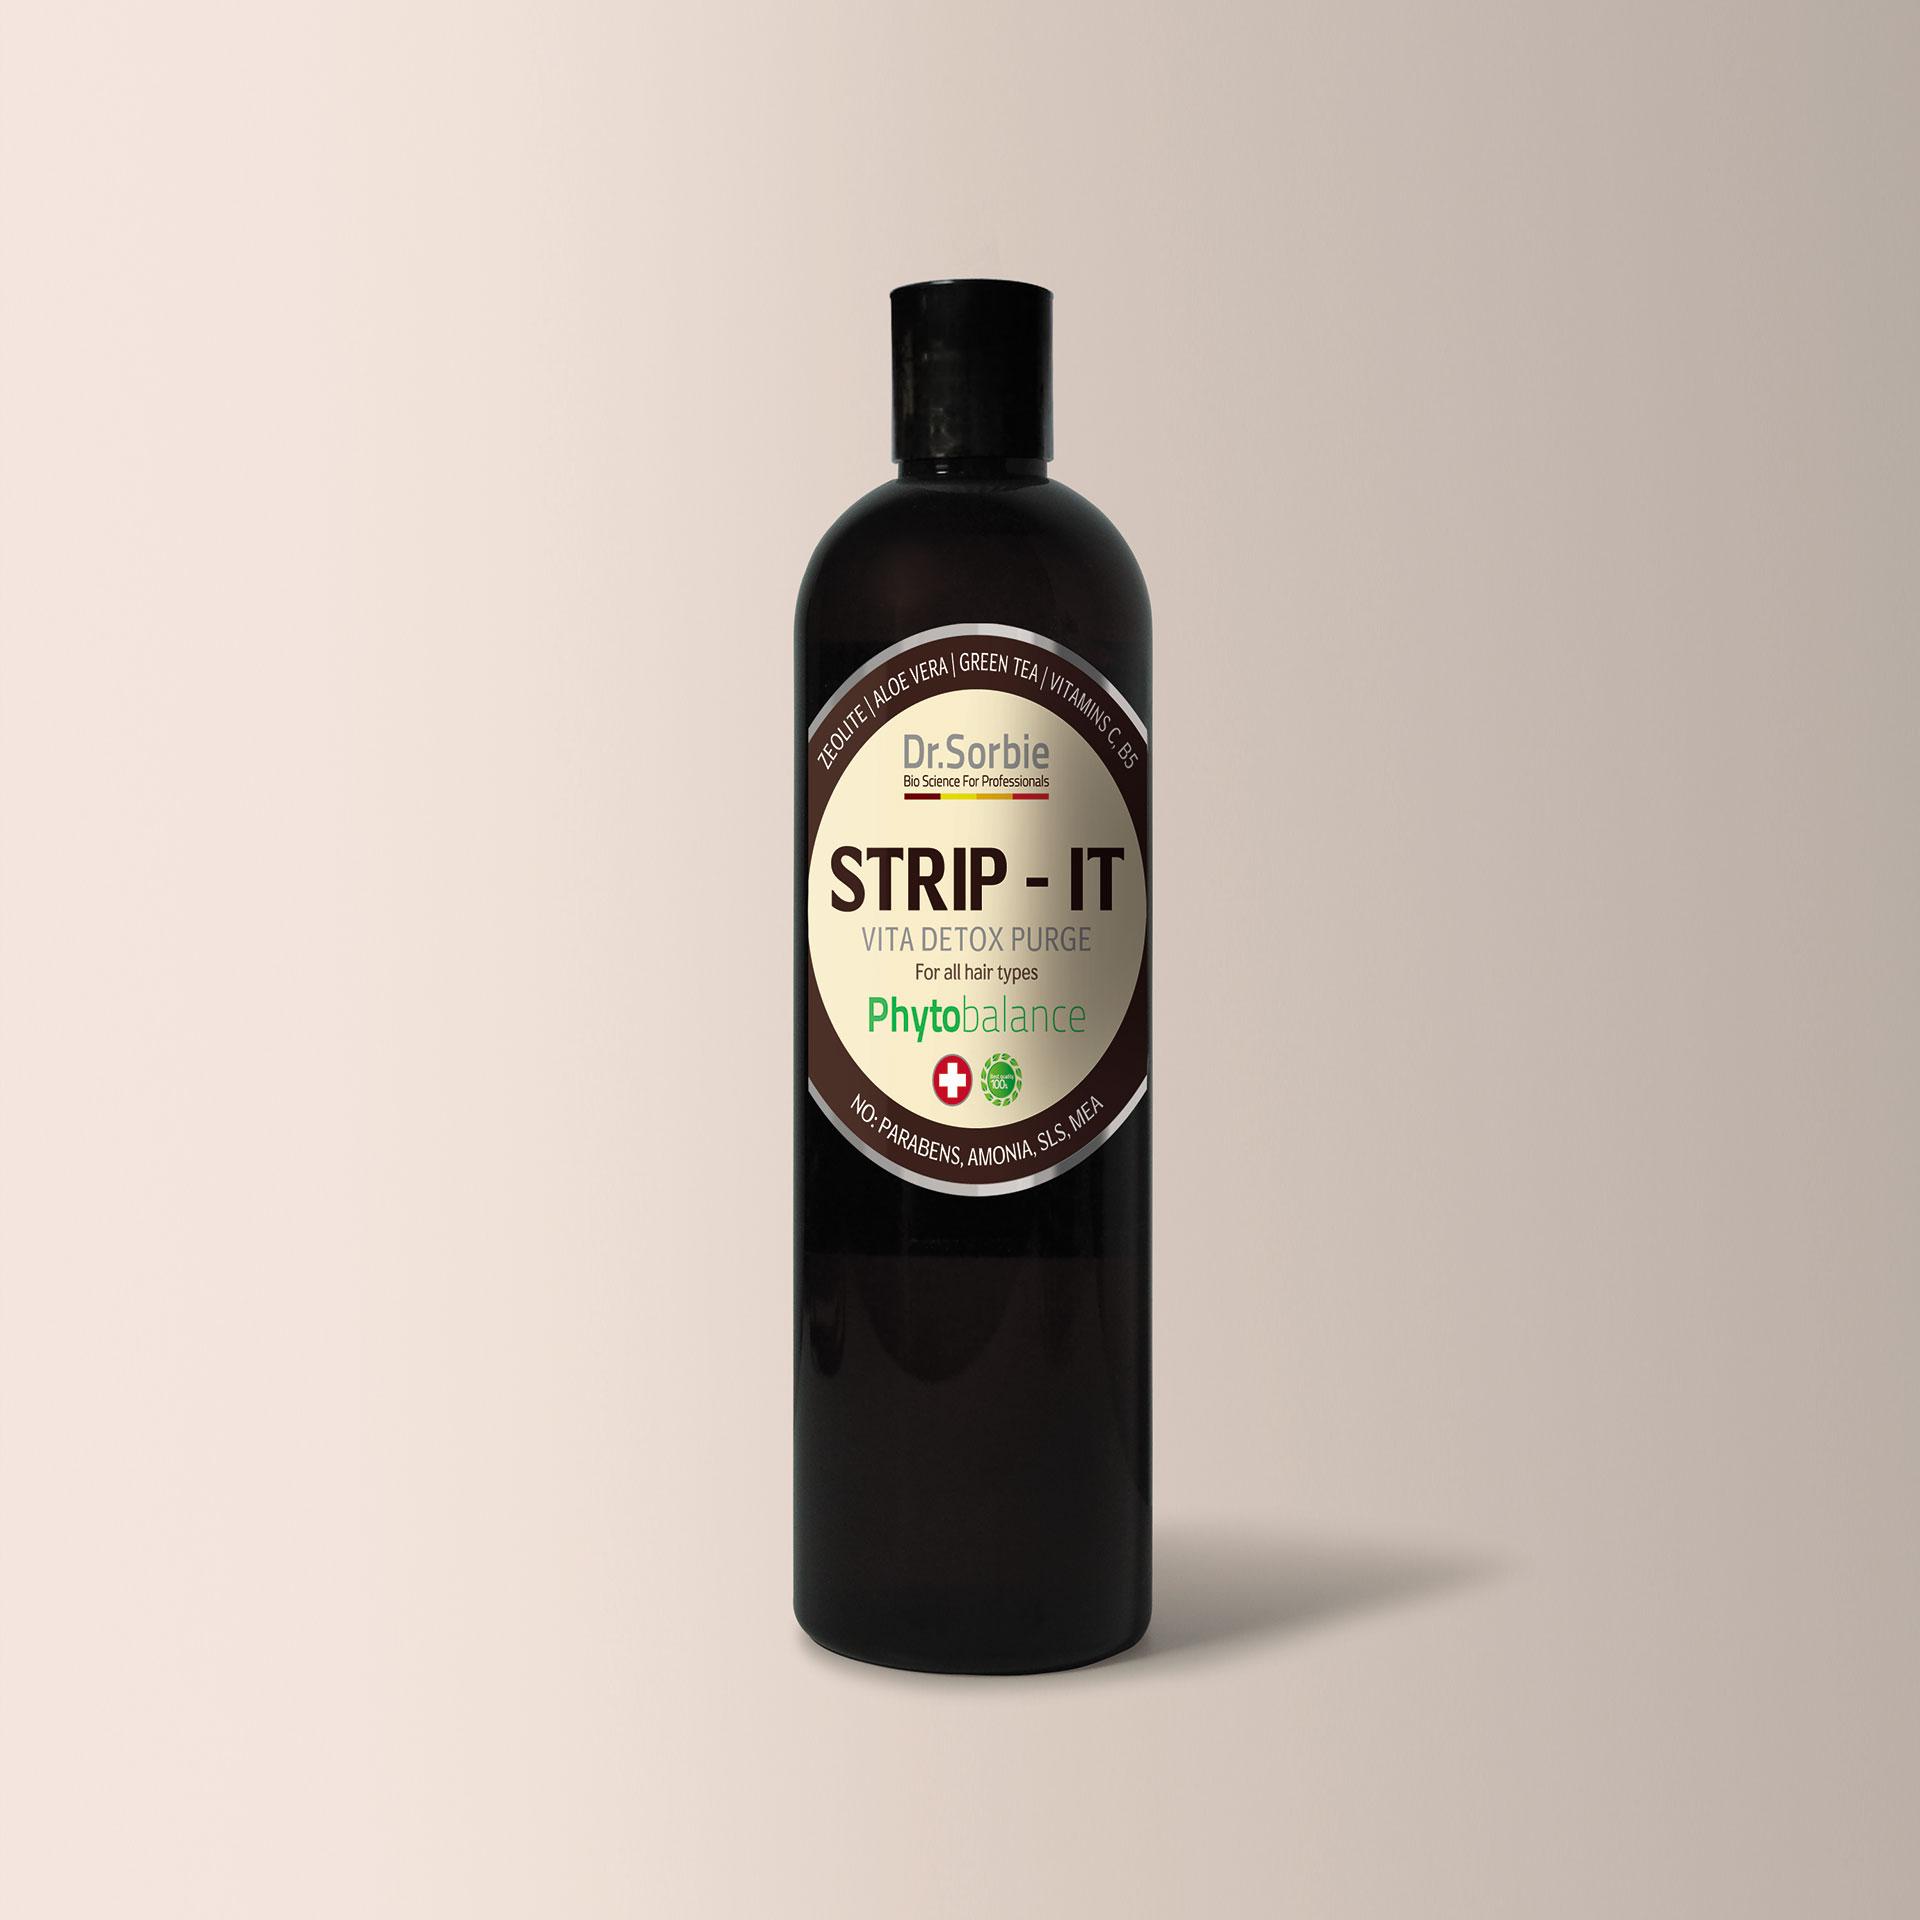 Strip-IT by Dr. Sorbie